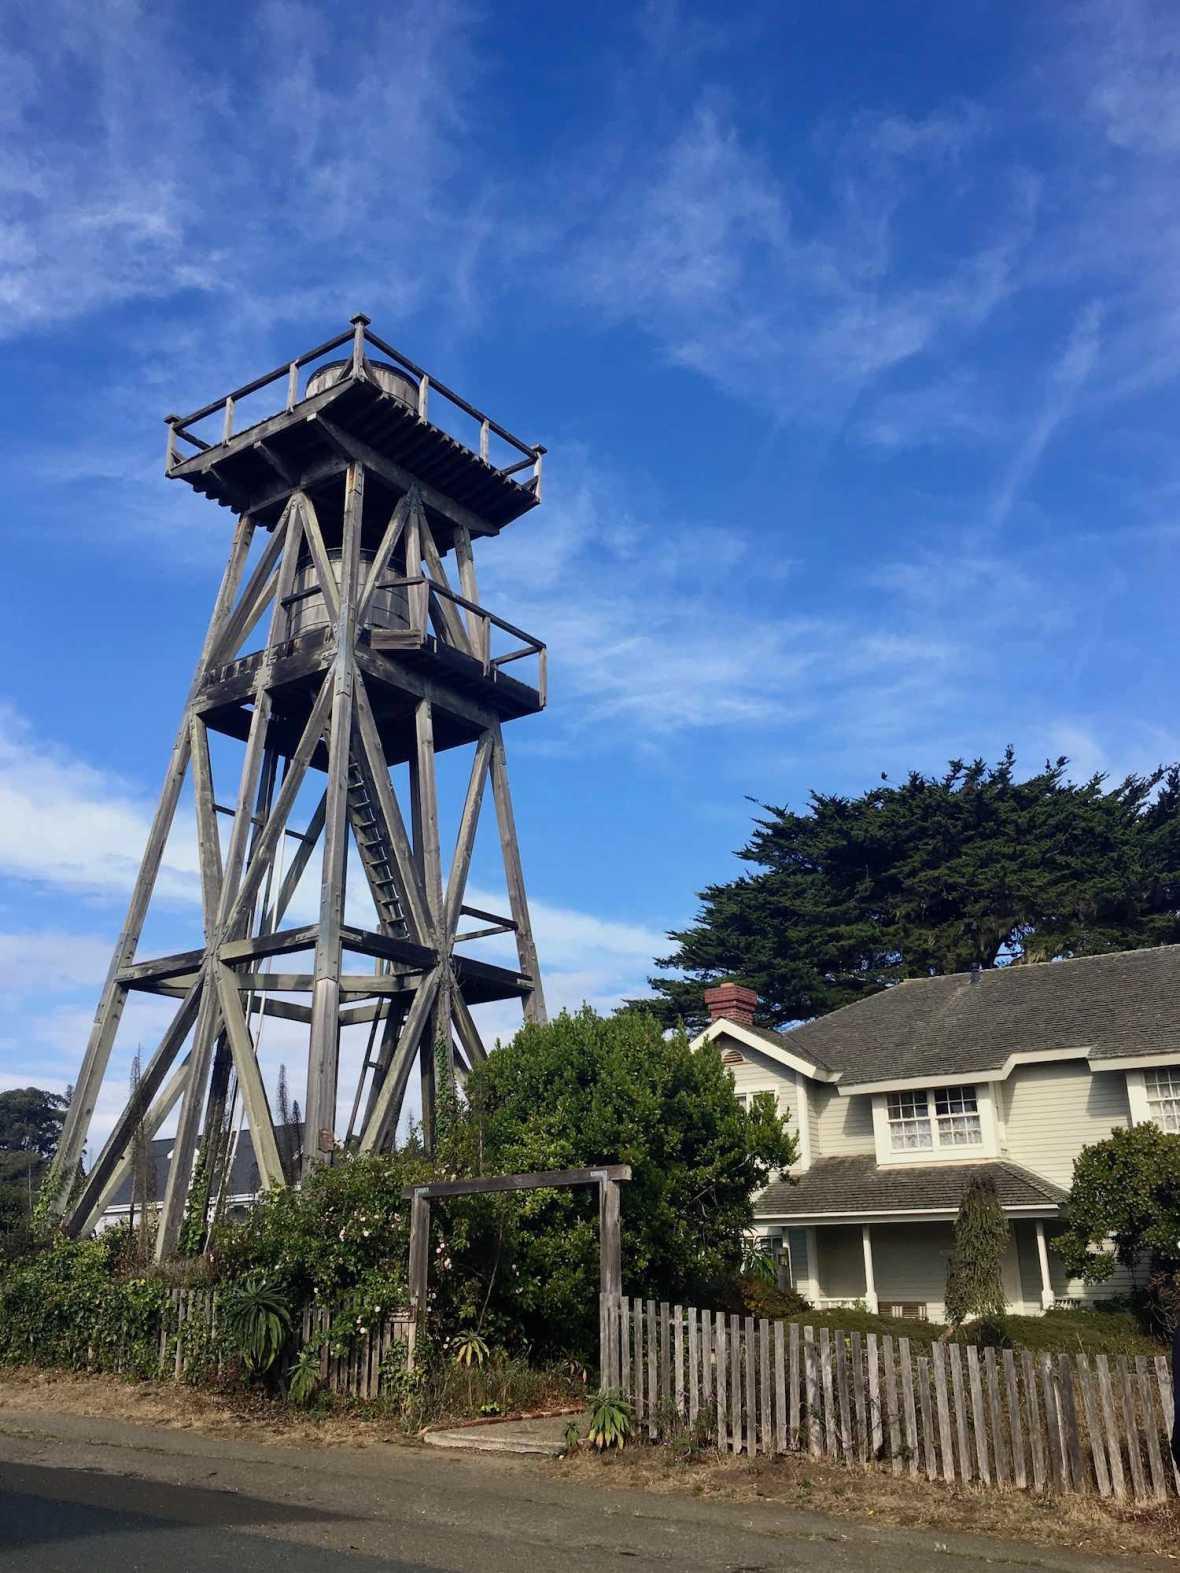 Water tower in Mendocino, California